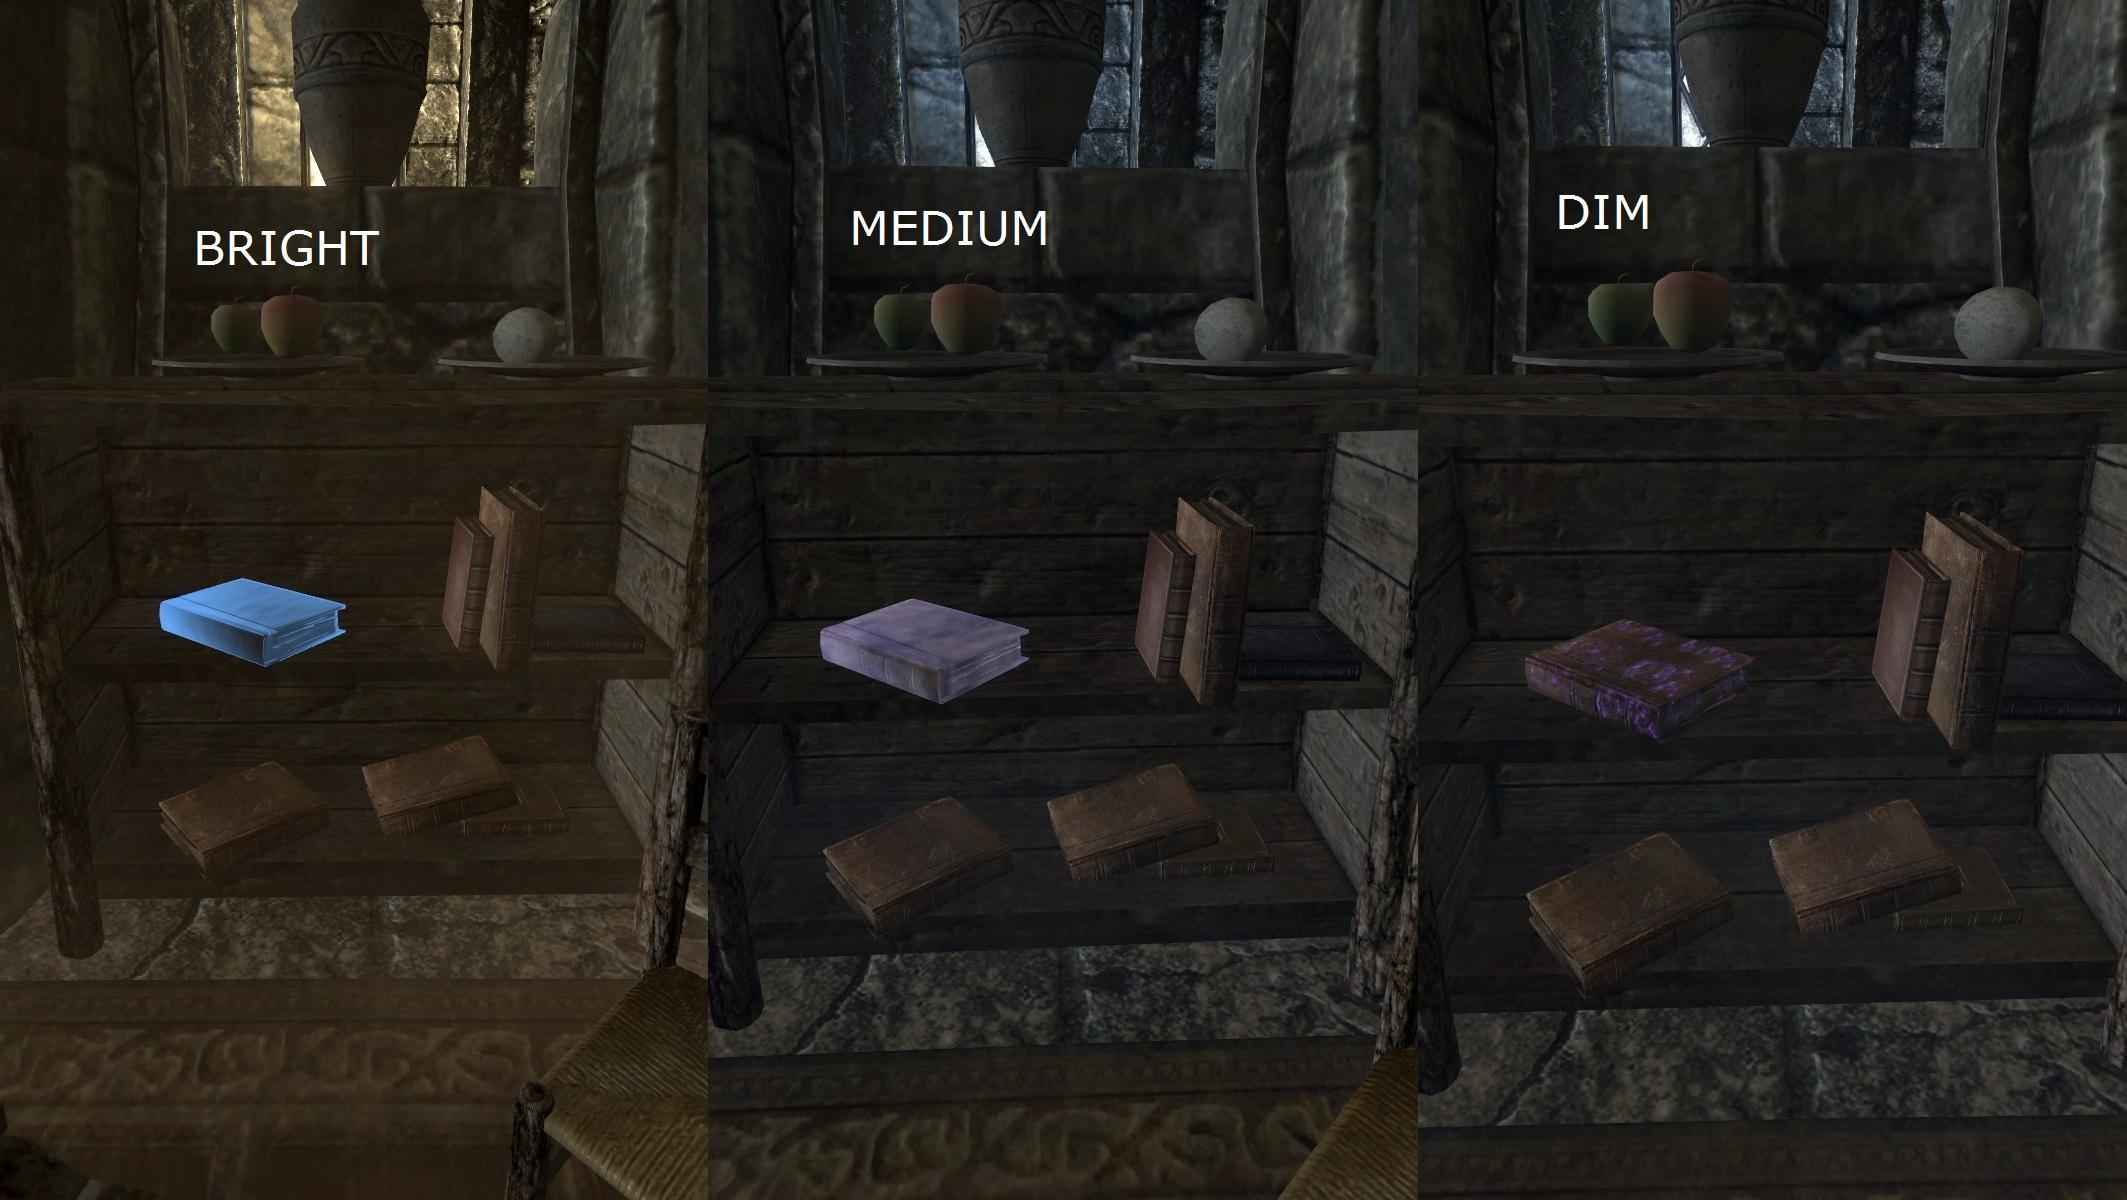 the best skyrim mods: unread books glow